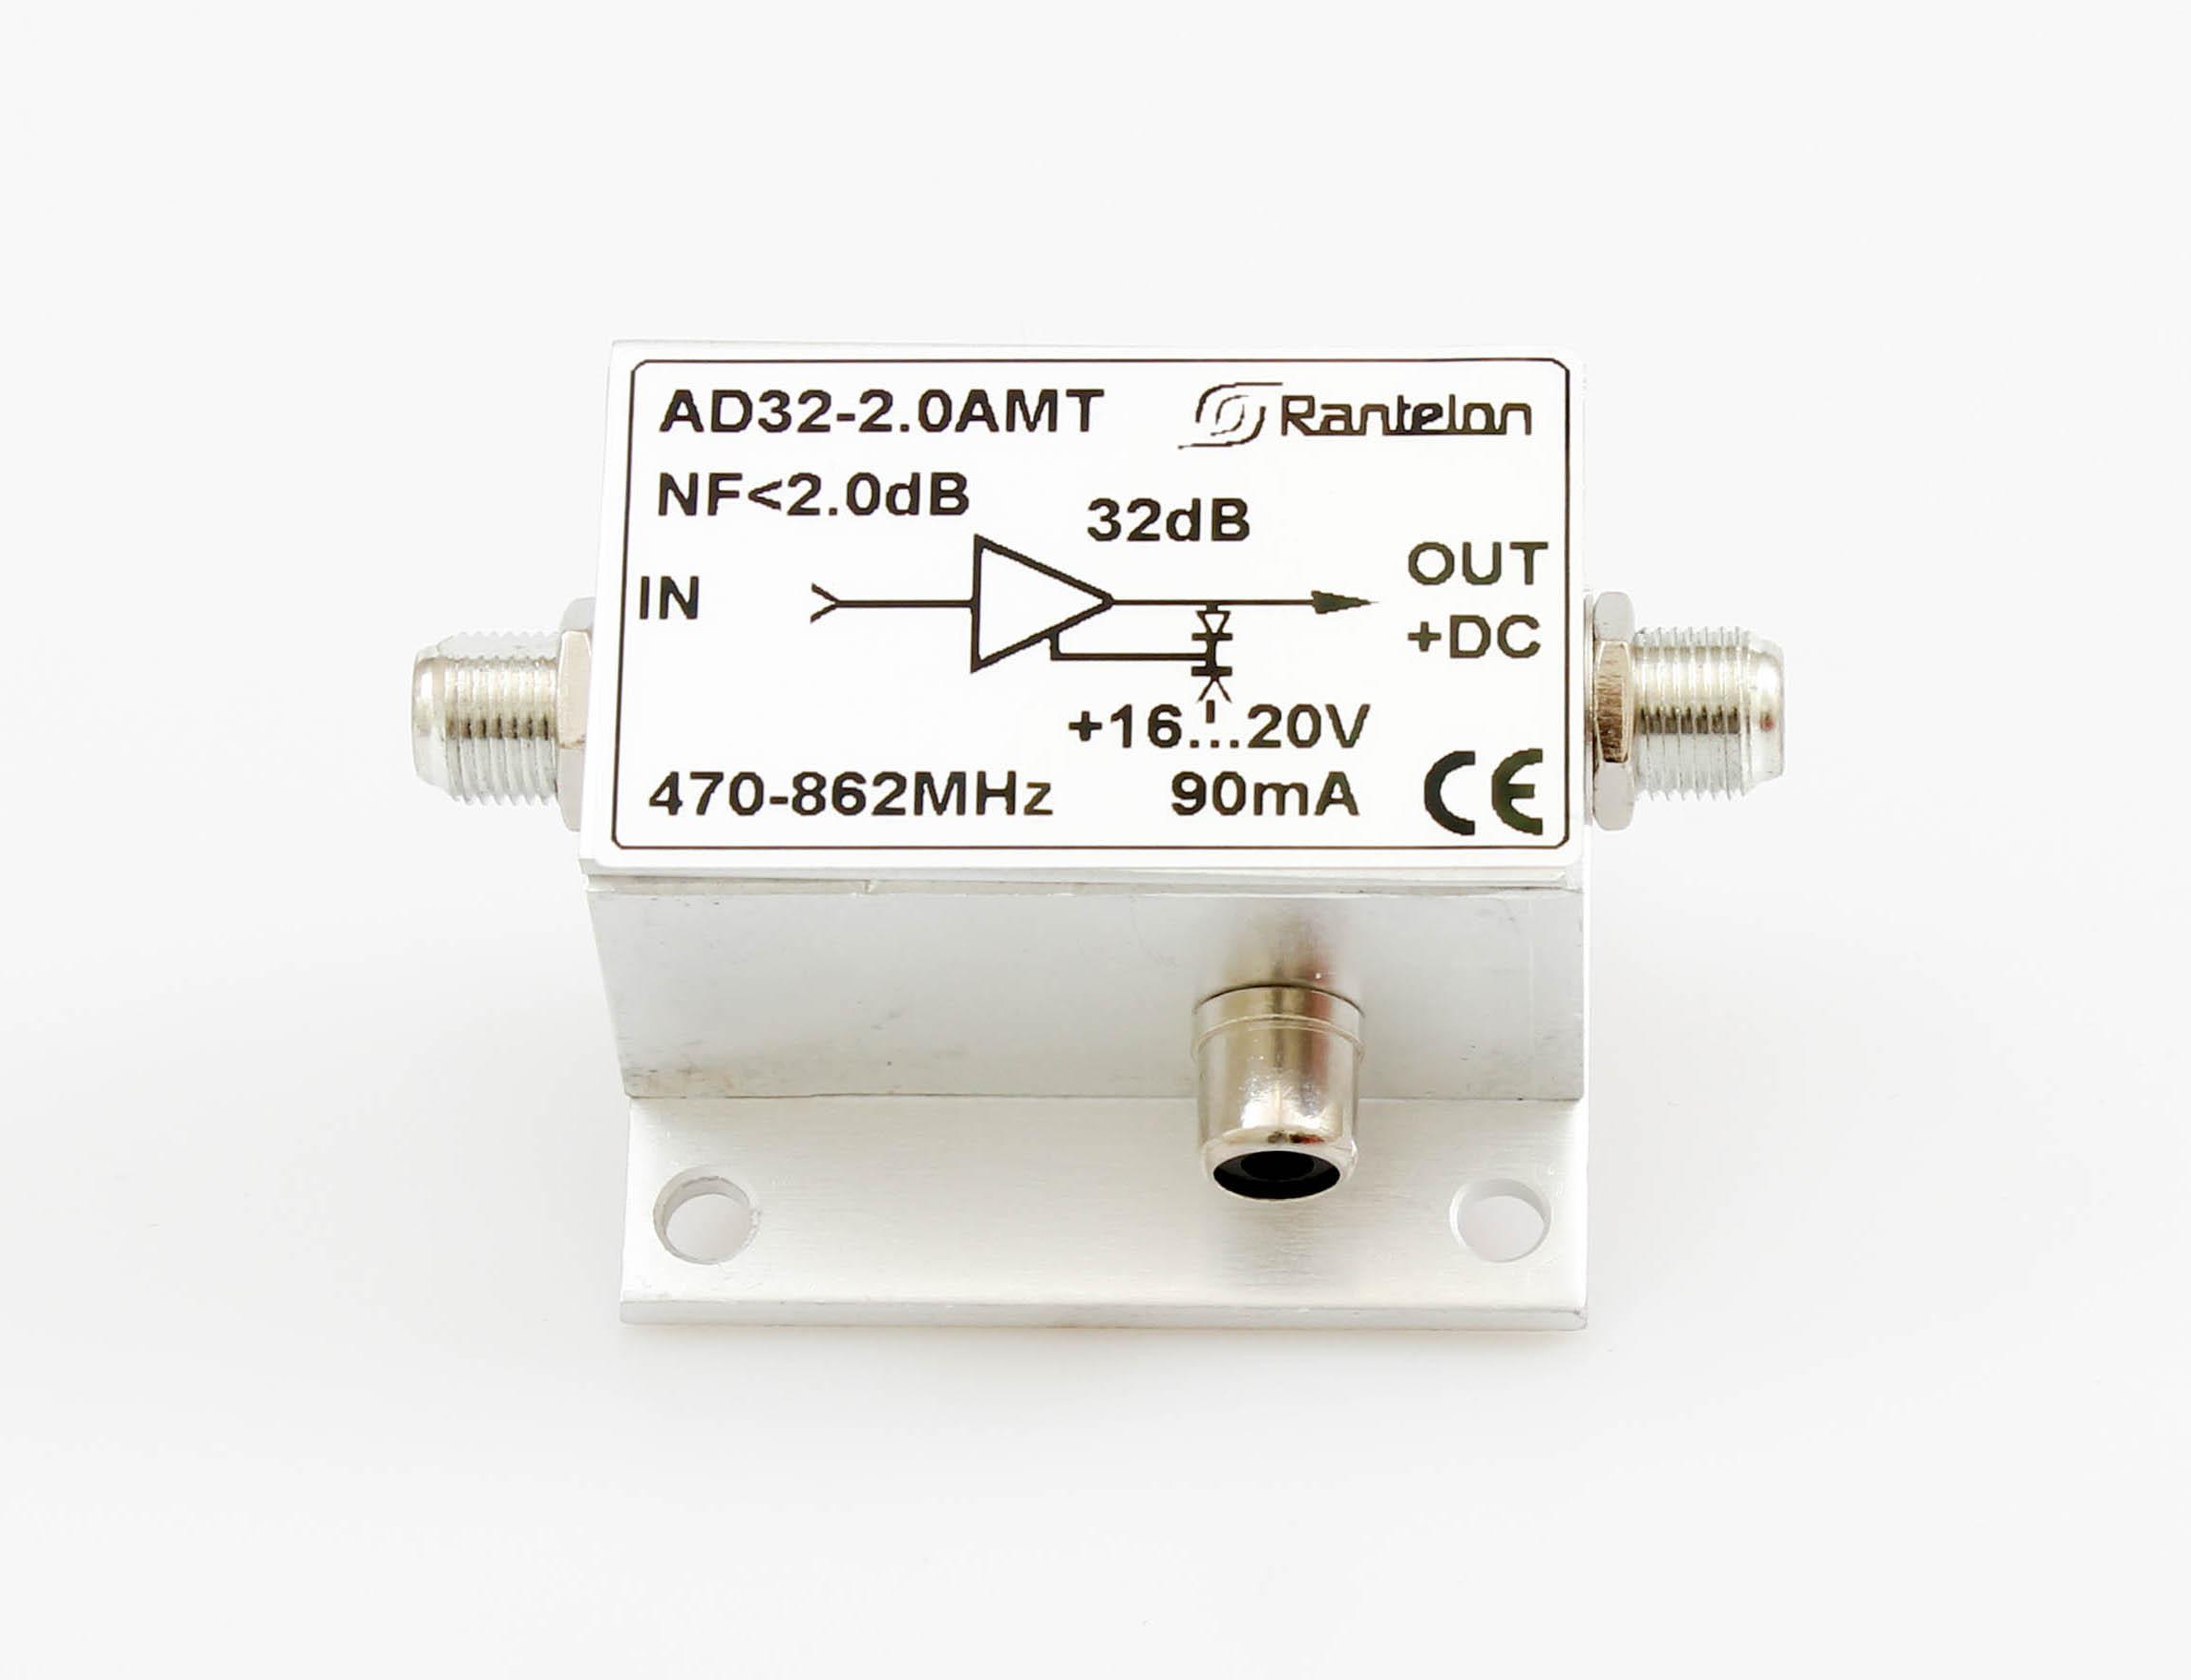 AD32-2.0/AMT